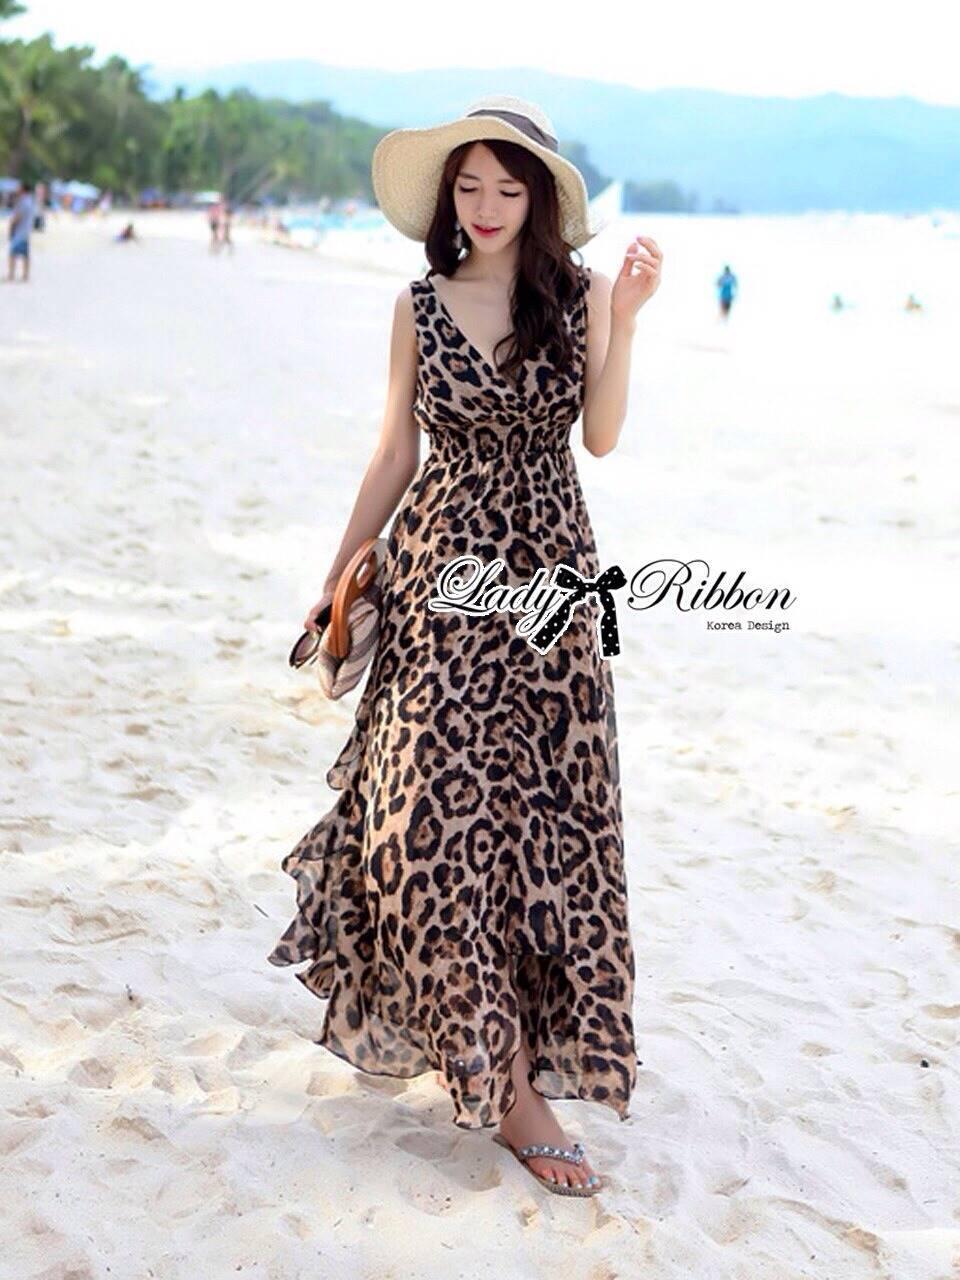 Lady Ribbon Sassy Leopard Maxi เดรสชีฟอง ลายเสือดาว